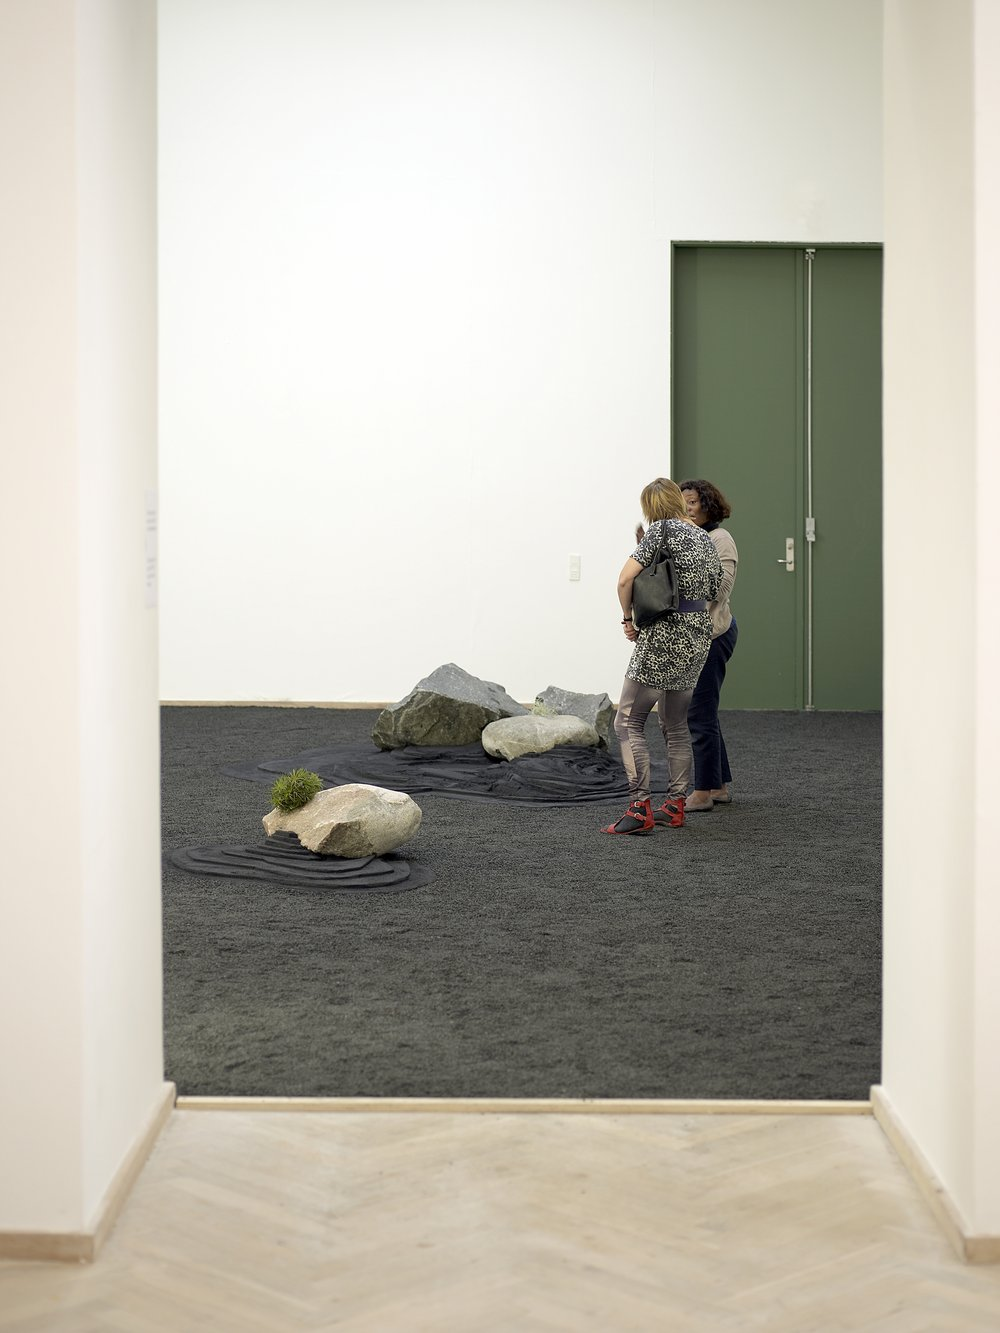 Make Yourself at Home, installation view, Taste of a Stone by Otobong Nkanga, Kunsthal Charlottenborg, 2010.